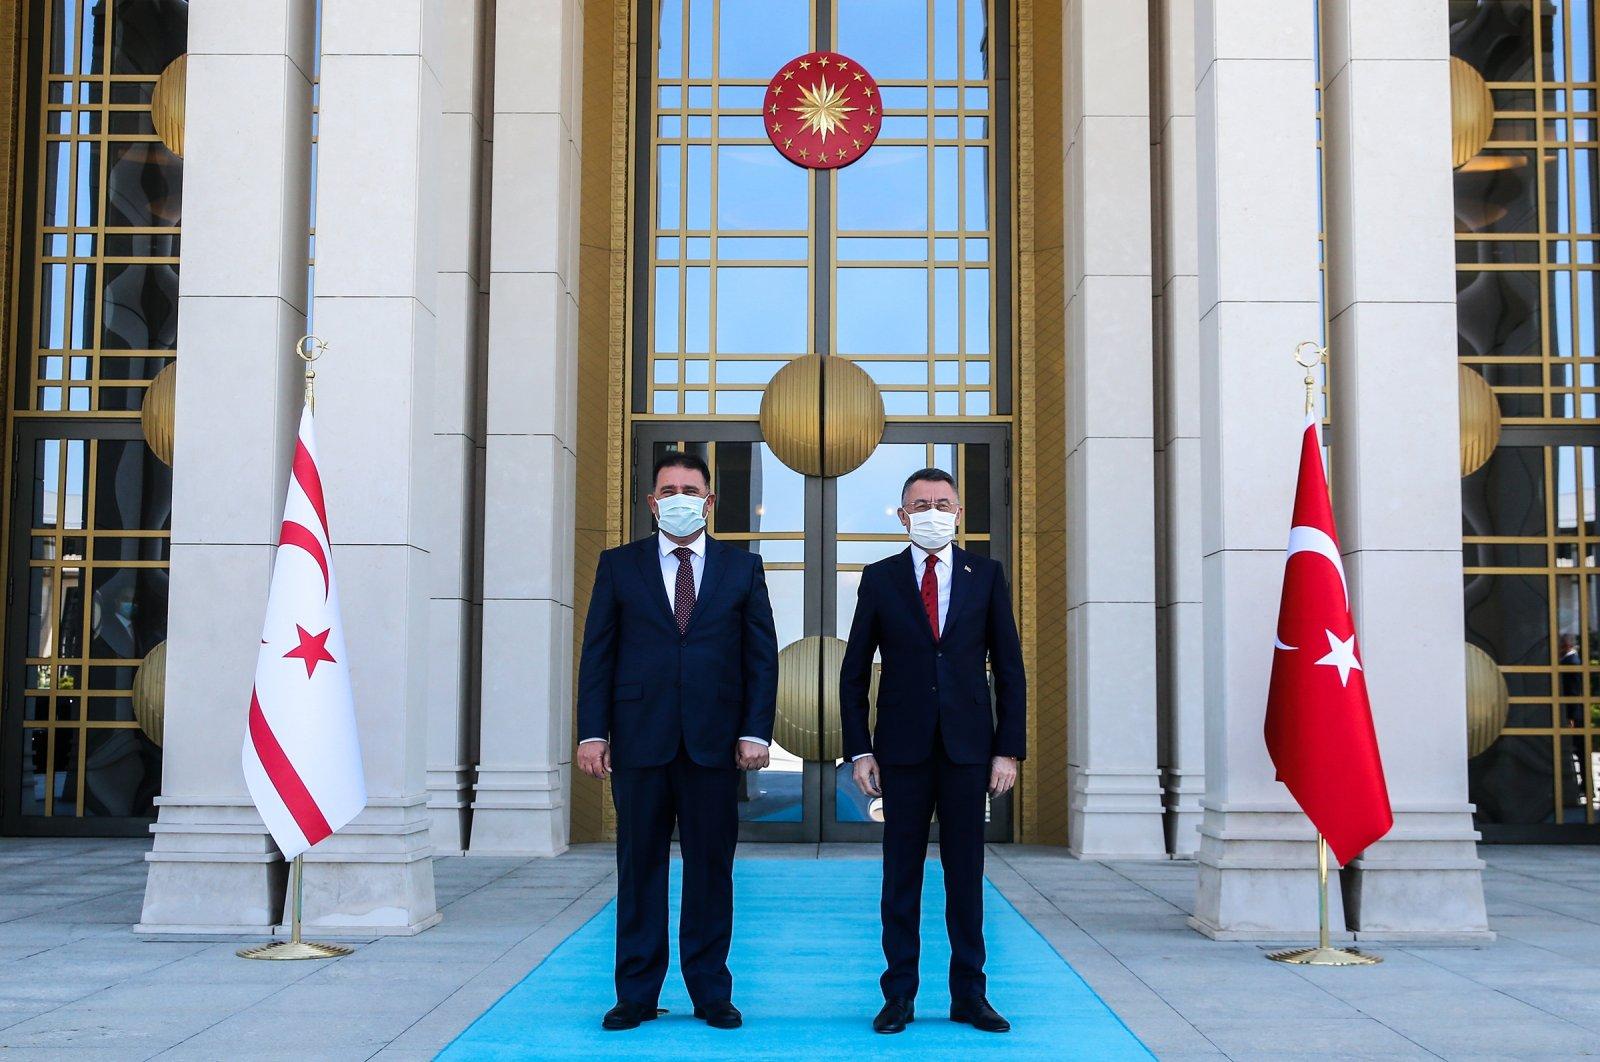 Turkish Vice President Fuat Oktay (R) receives TRNC Prime Minister Ersan Saner in the capital Ankara, Turkey, June 23, 2021. (AA Photo)